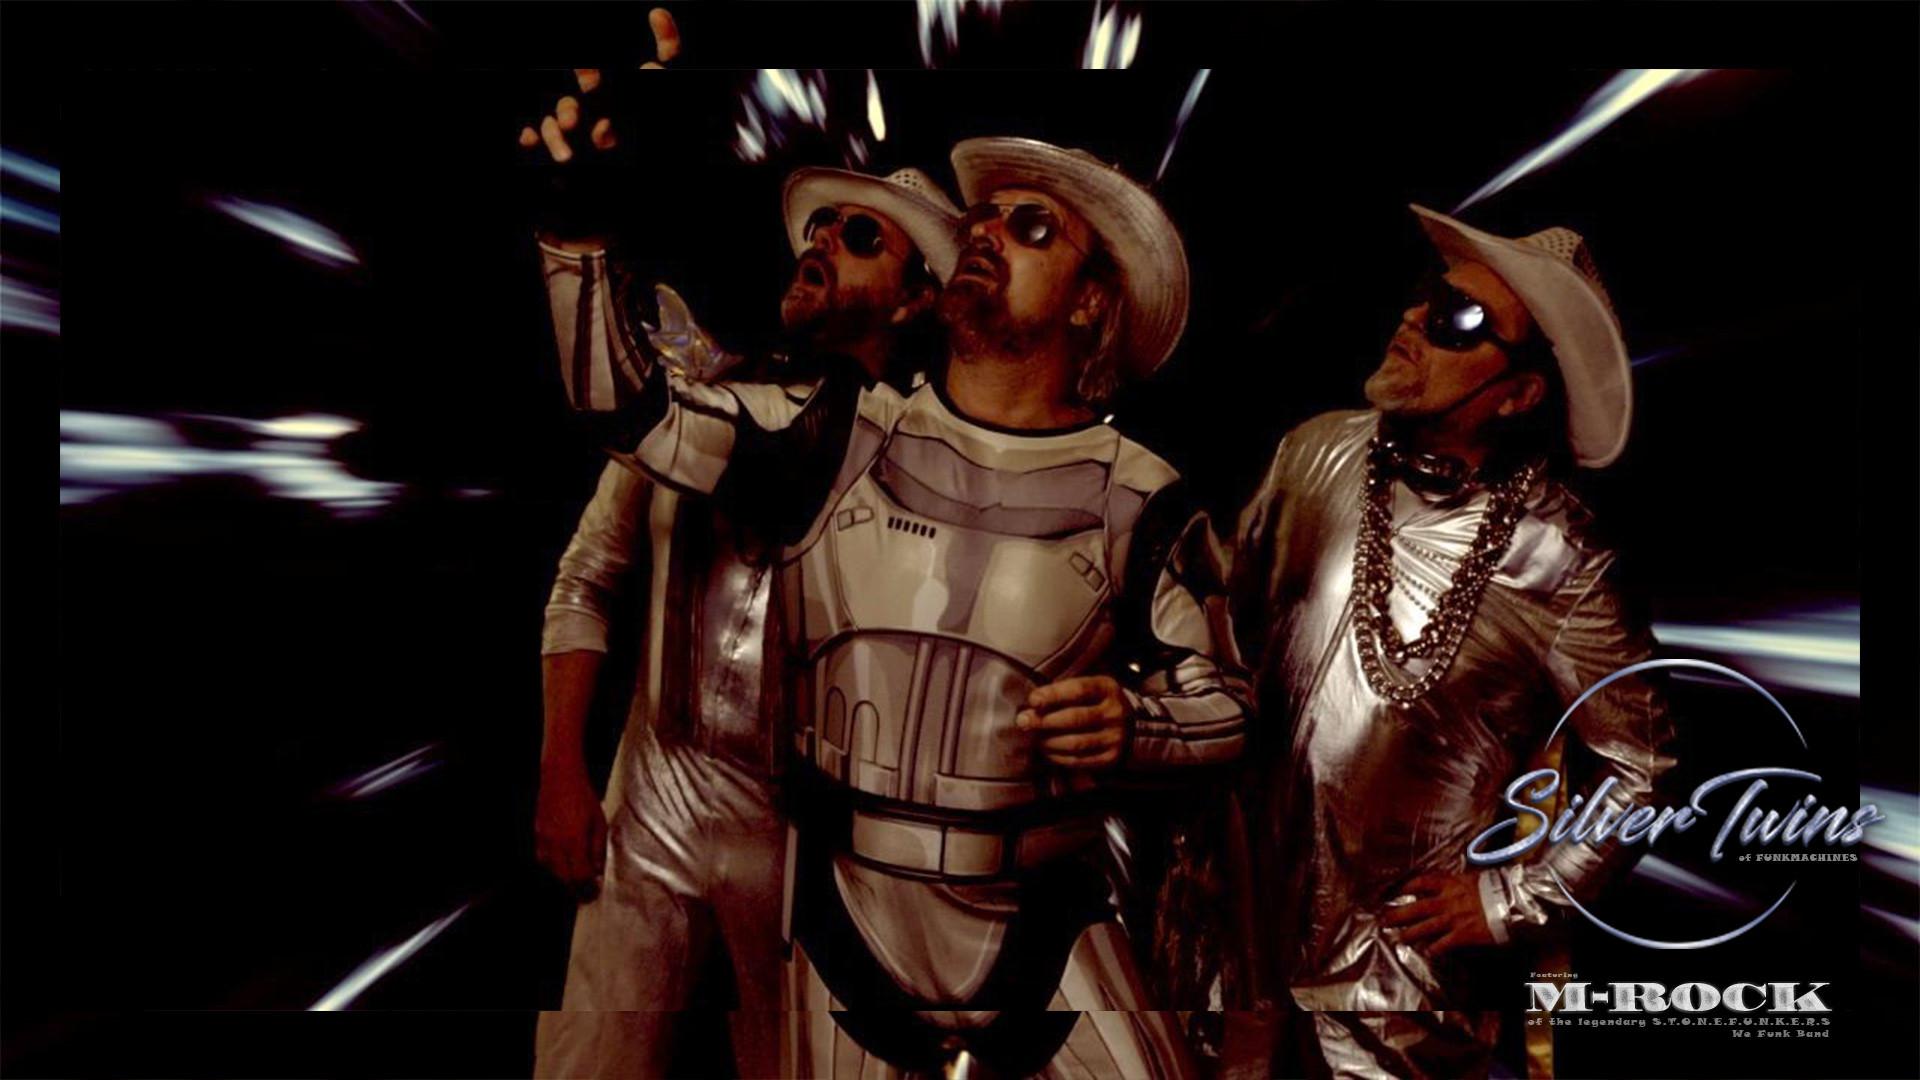 Time SilverTwins of funk alla tunnel.jpg